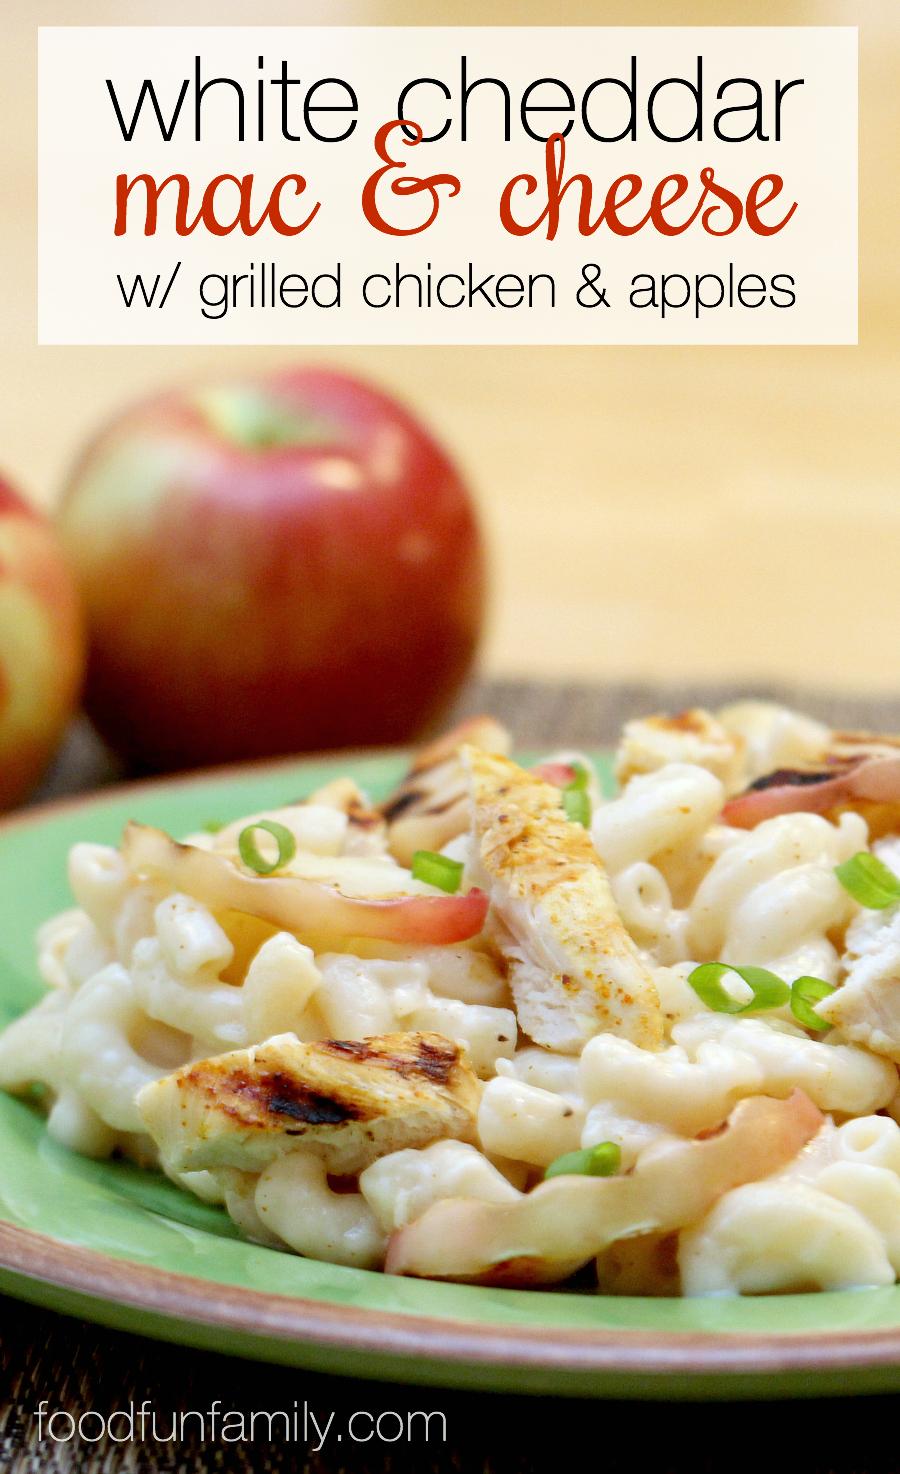 White Cheddar Macaroni And Cheese Recipe: White Cheddar Mac And Cheese With Grilled Chicken And